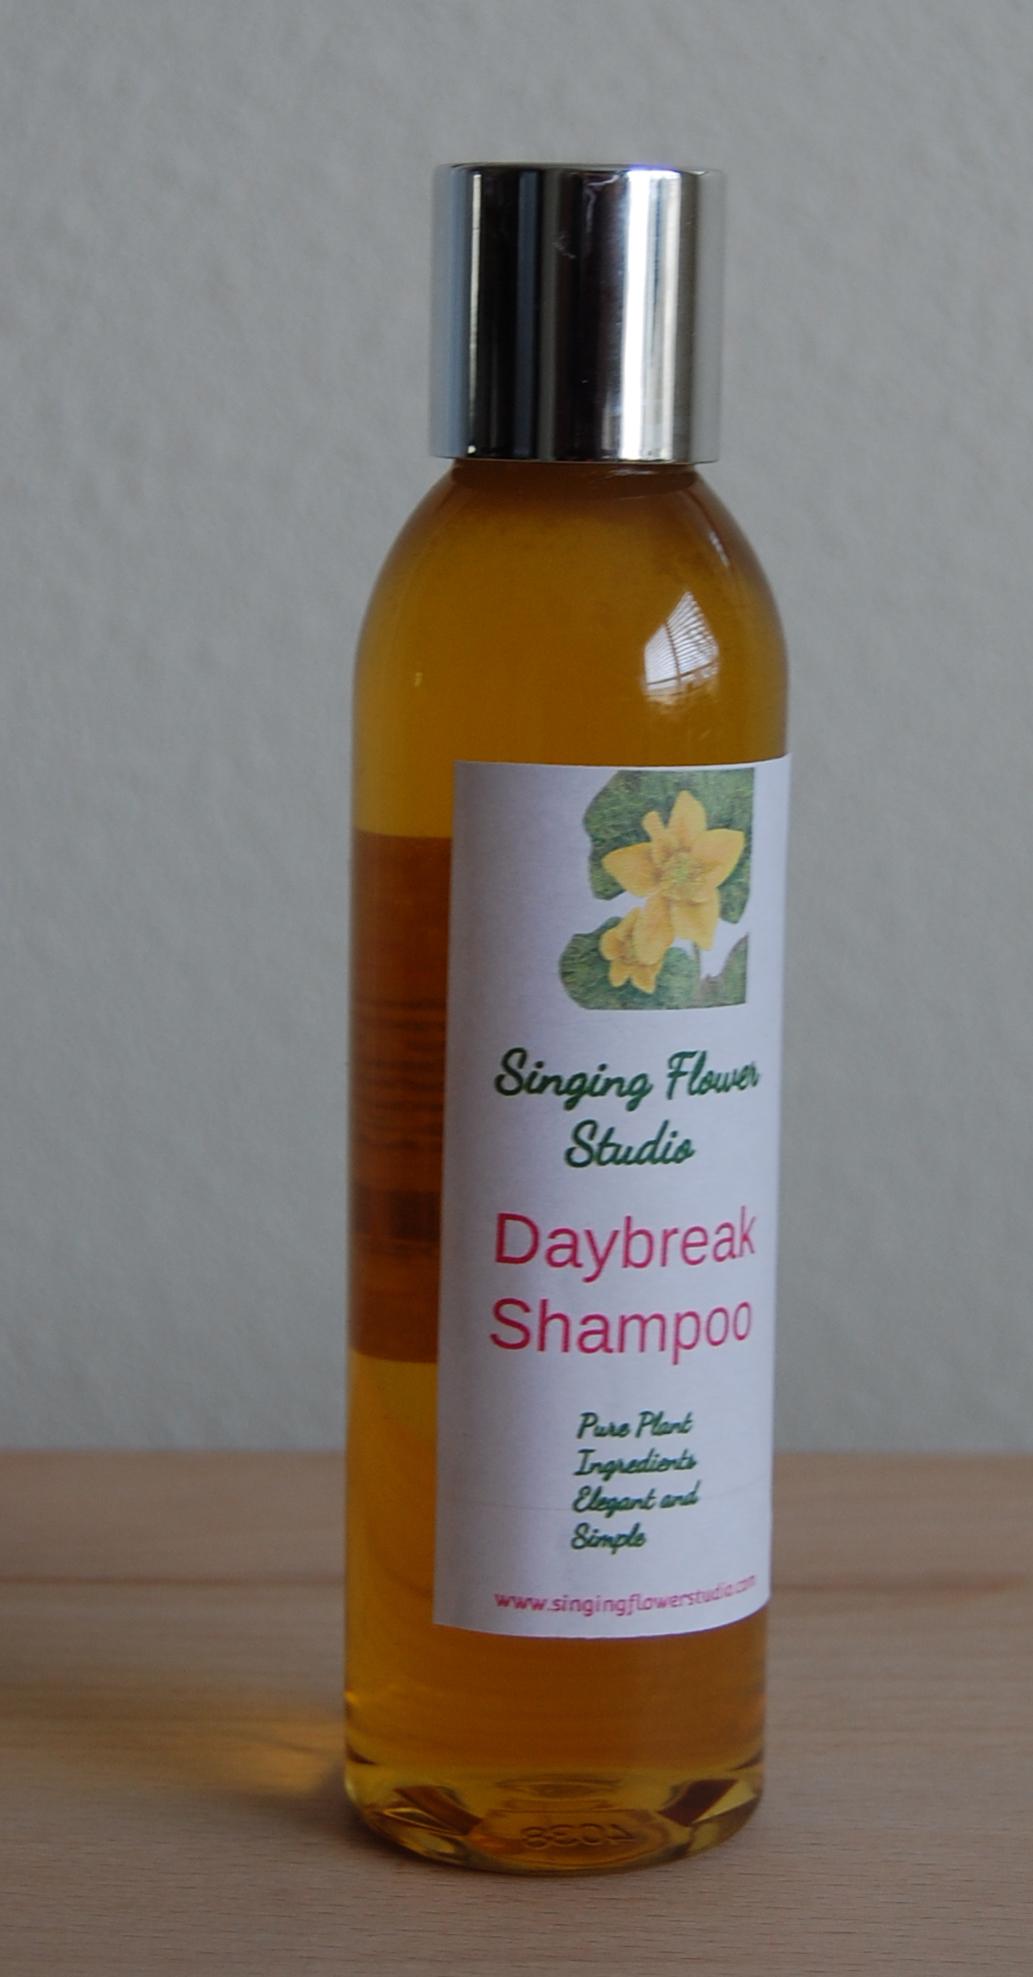 Daybreak Shampoo